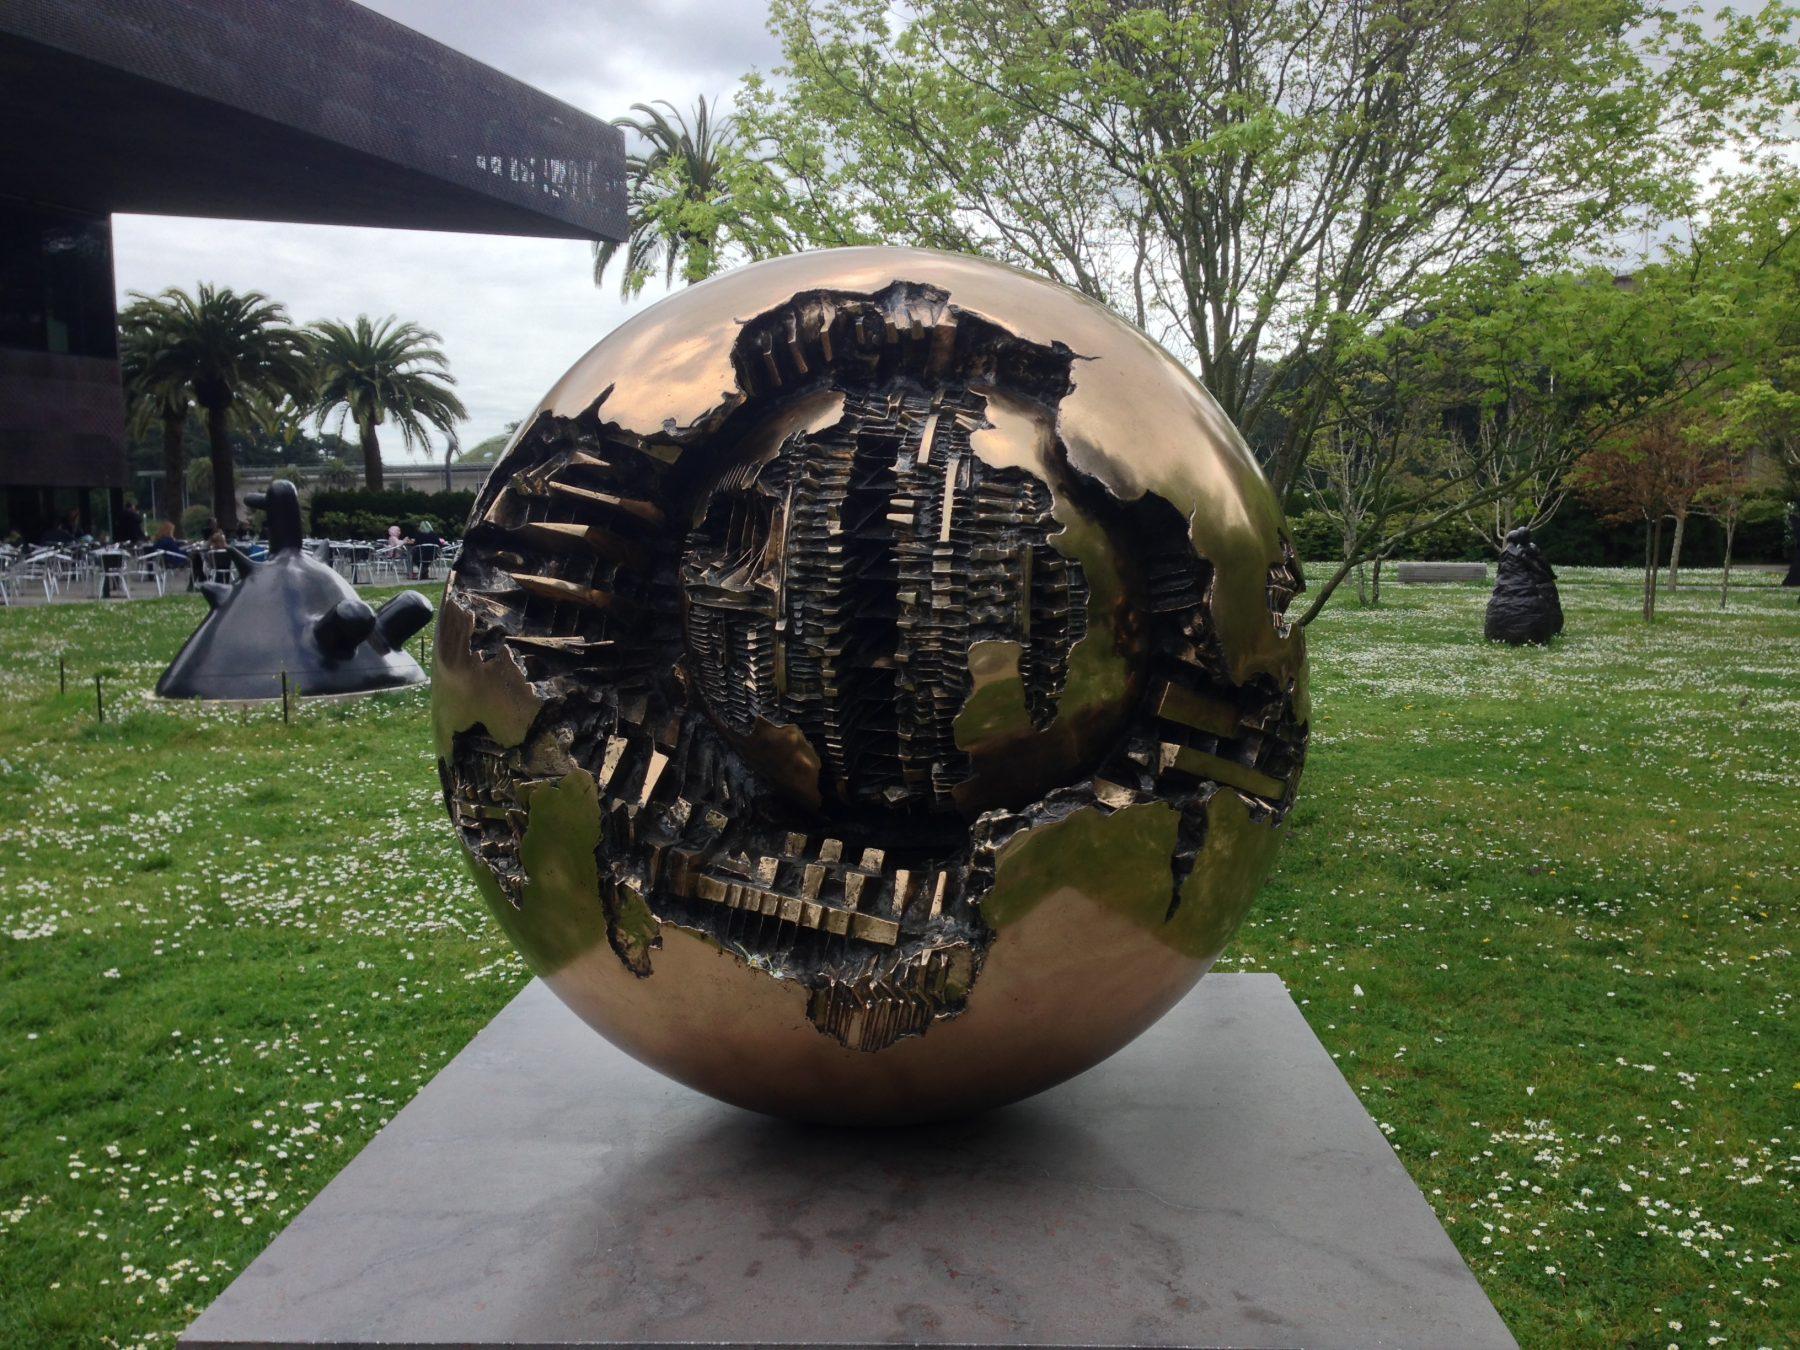 Golden Gate Park, De Young Museum Sculpture